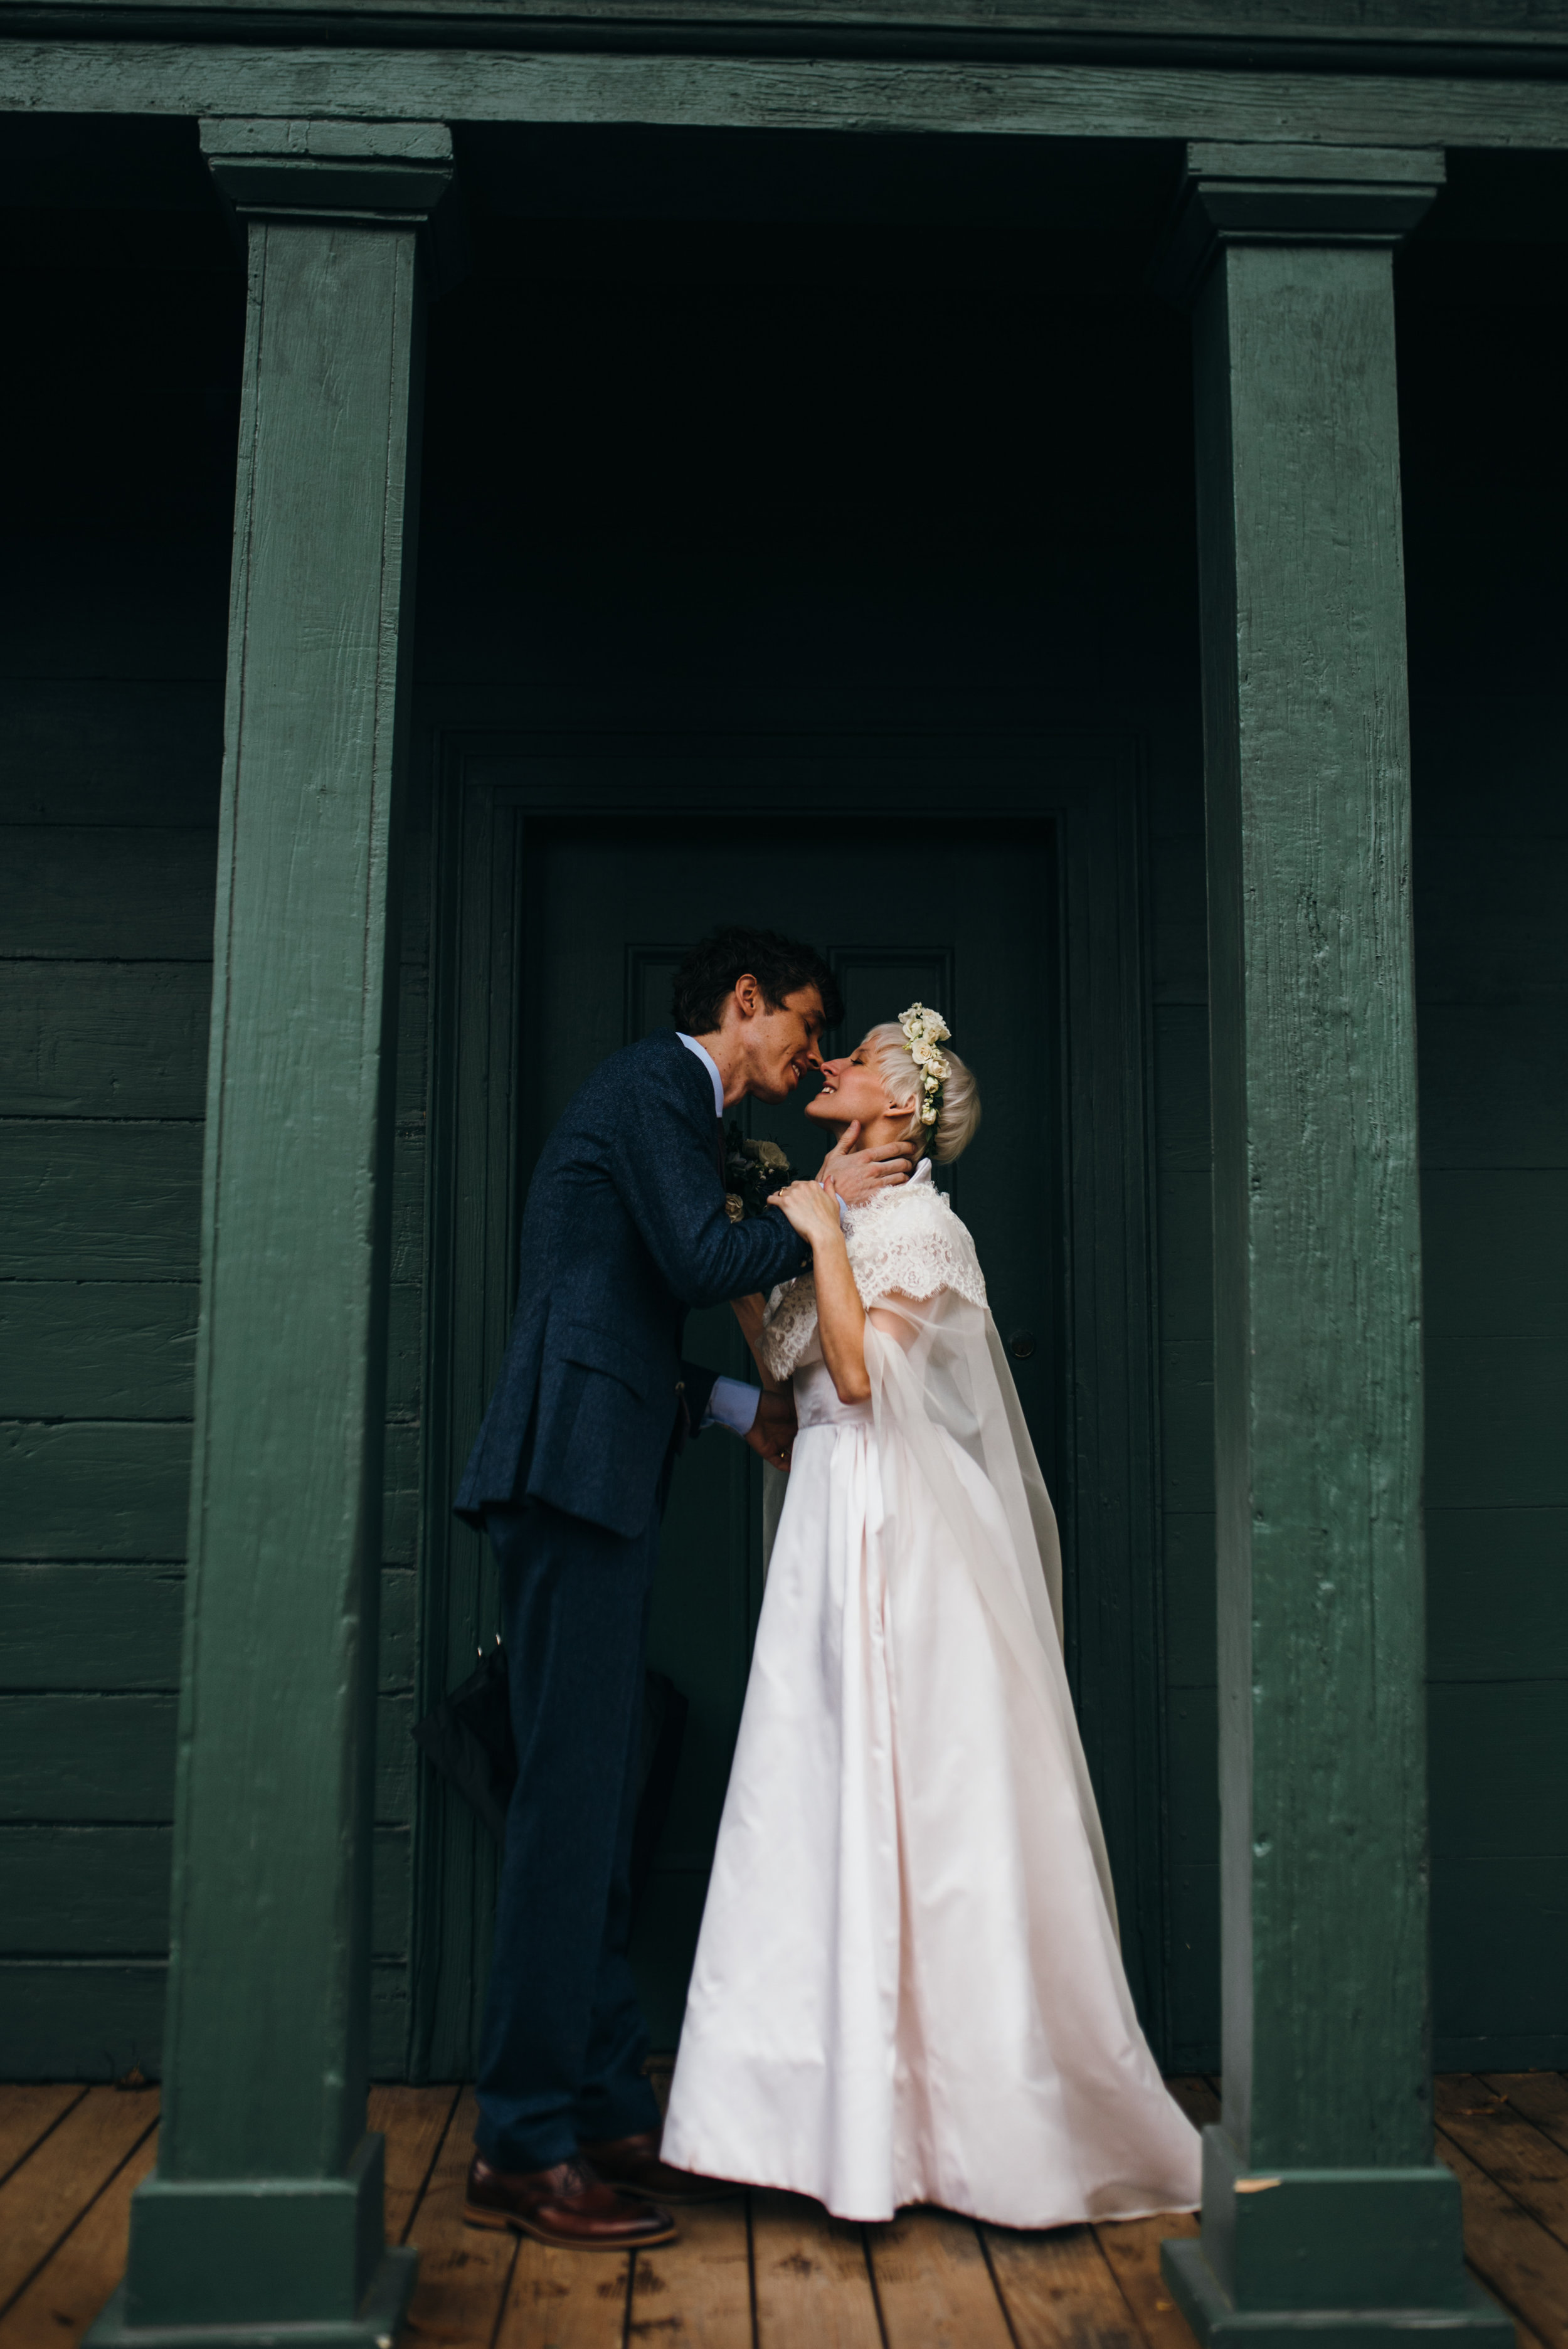 raleigh wedding photographer - north carolina wedding photographer - downtown raleigh wedding